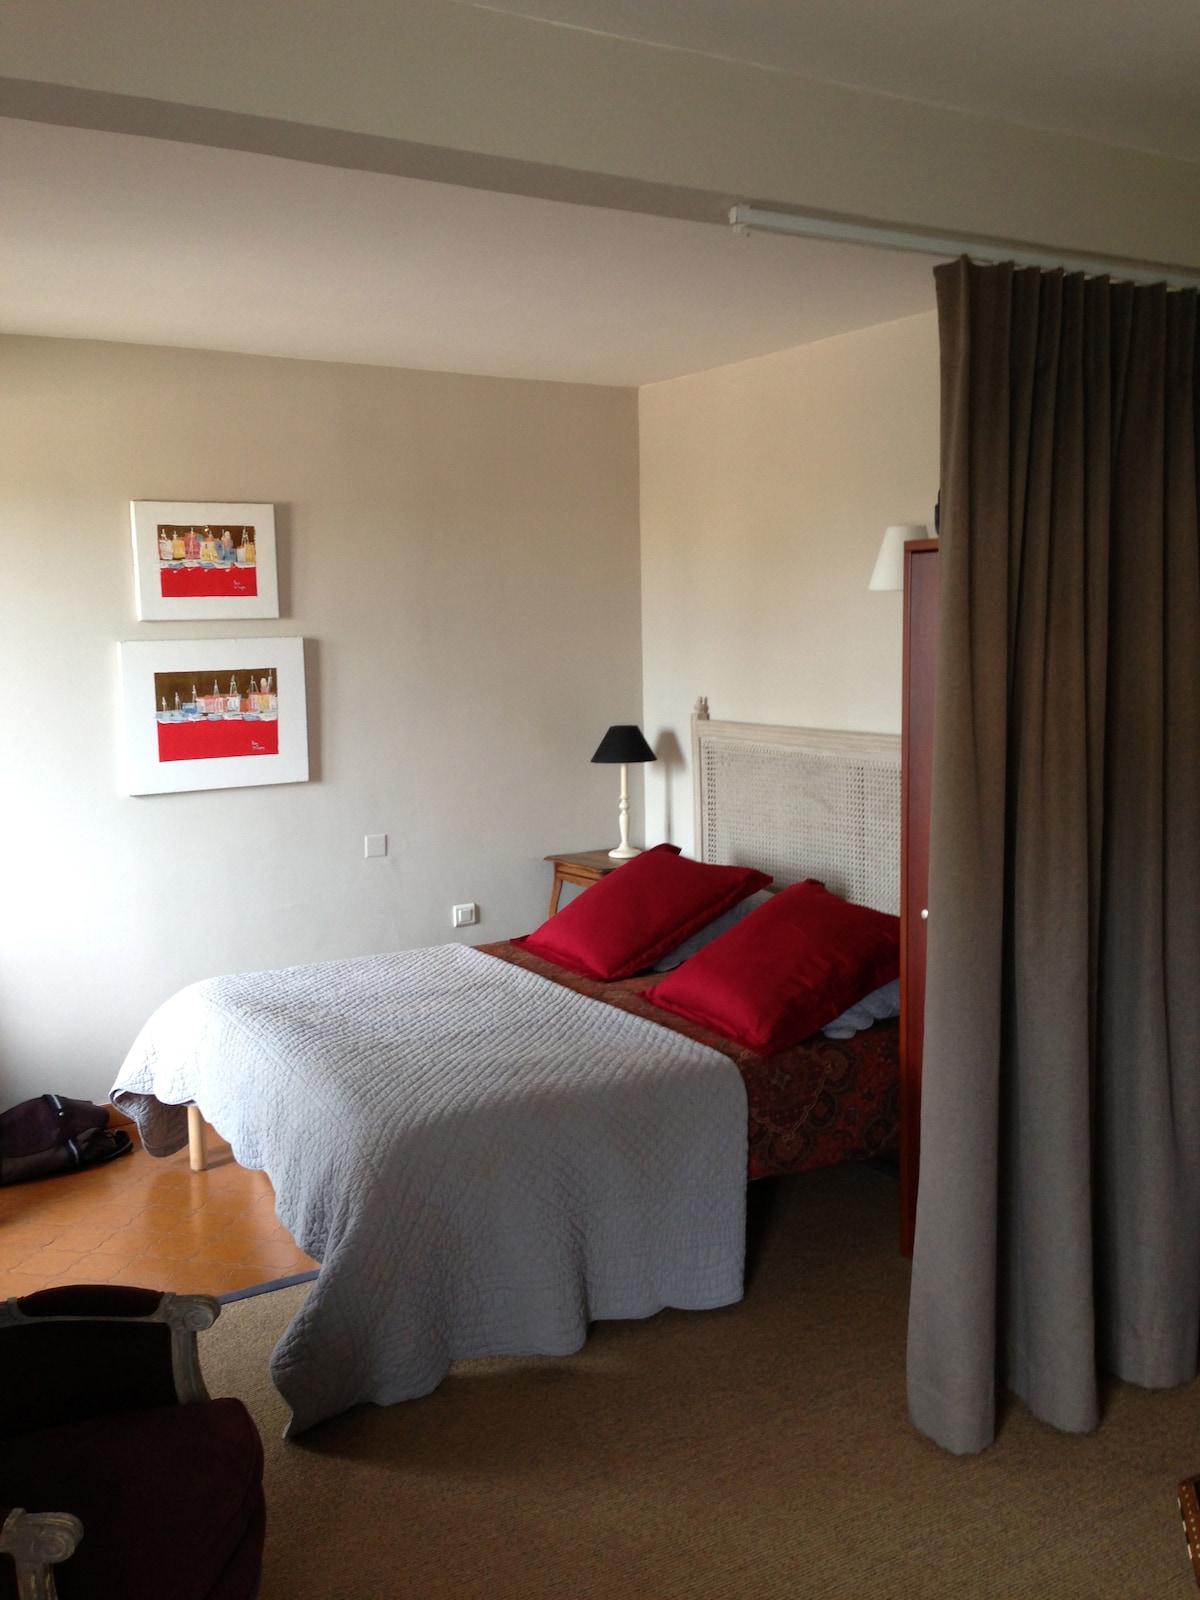 Lit double d'1m60 - Queen size bed